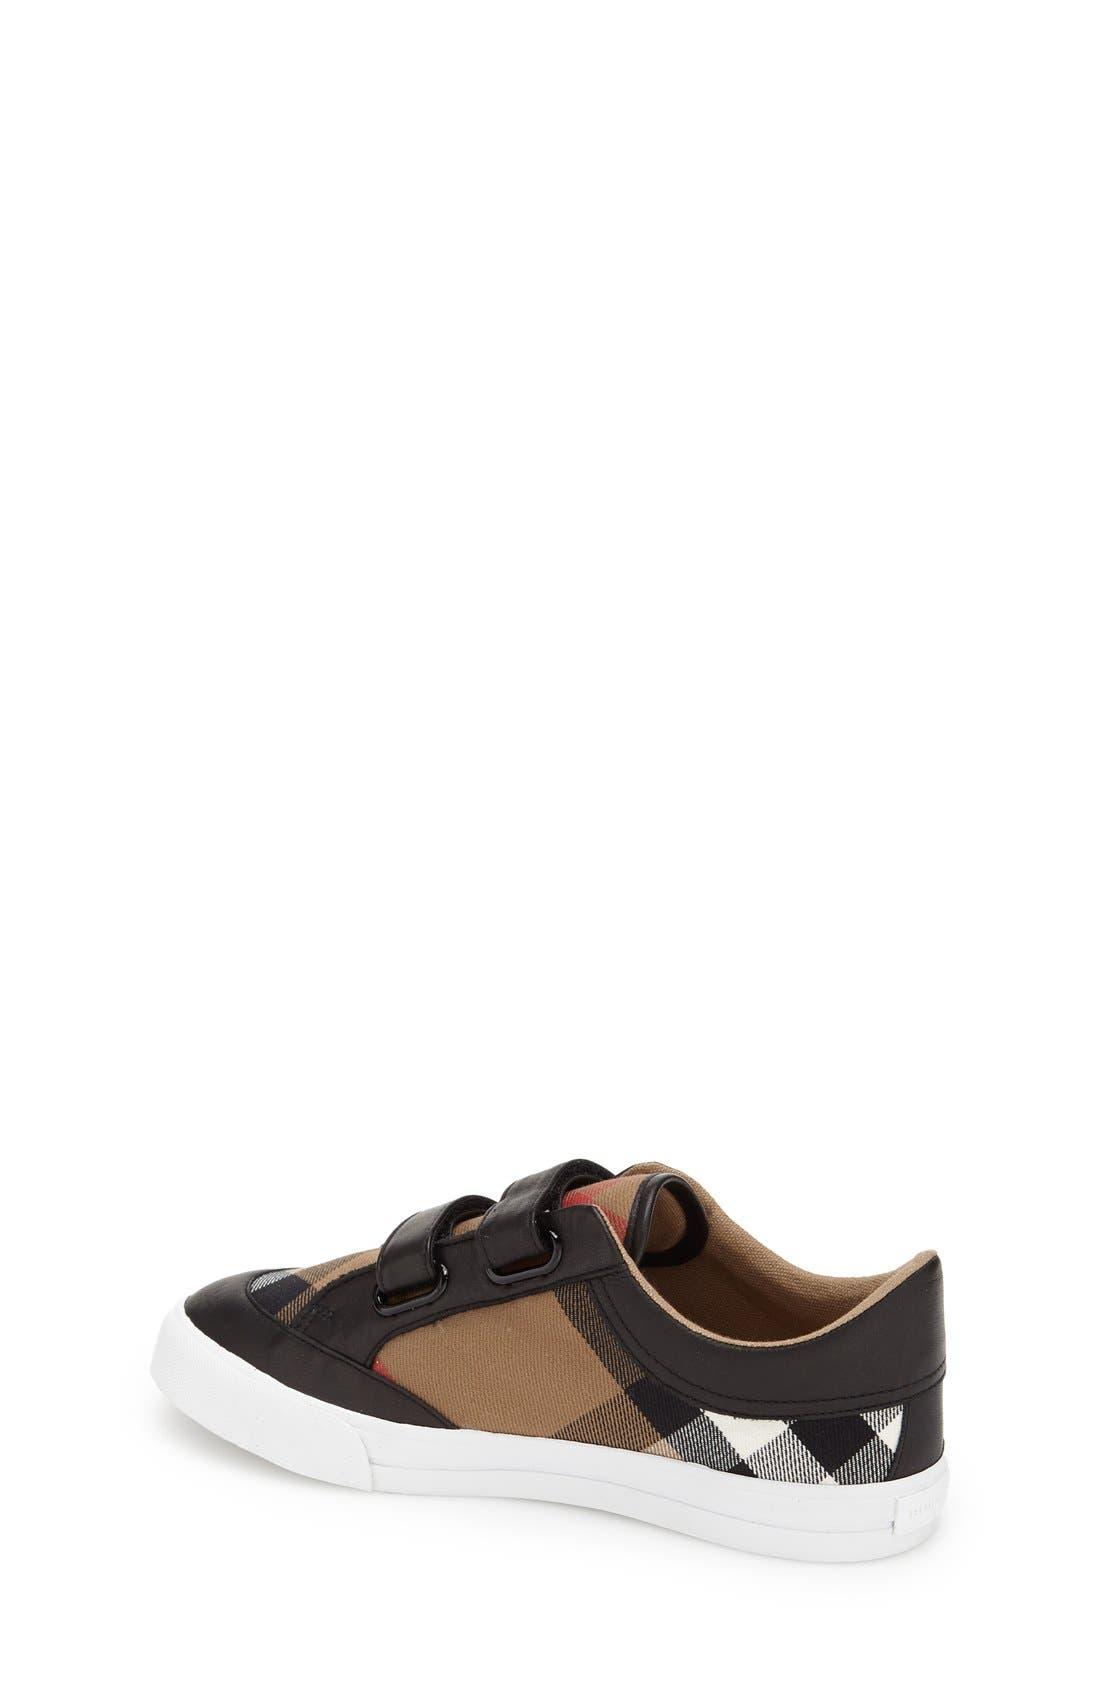 BURBERRY,                             Mini Heacham Sneaker,                             Alternate thumbnail 3, color,                             001